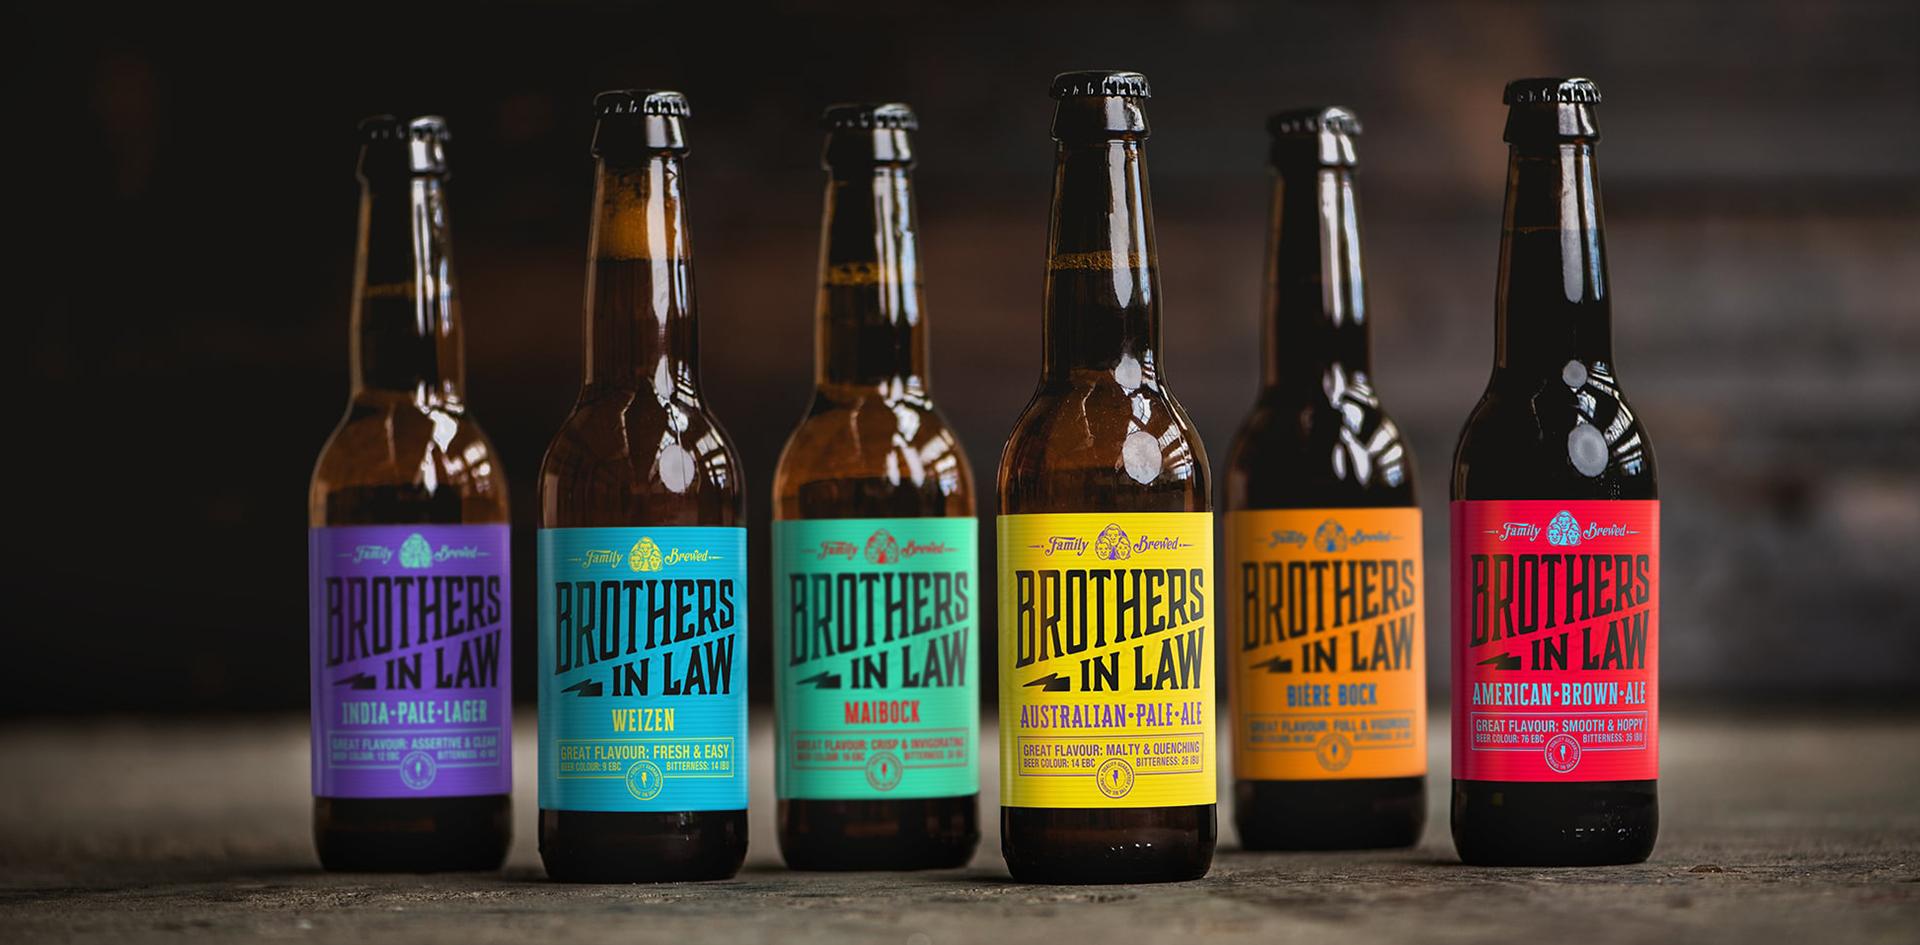 nectar-utrecht-pils-bier-brouwerij-nederland-streekbier-amsterdam-bil-brewing-brothers-in-law-foto-02